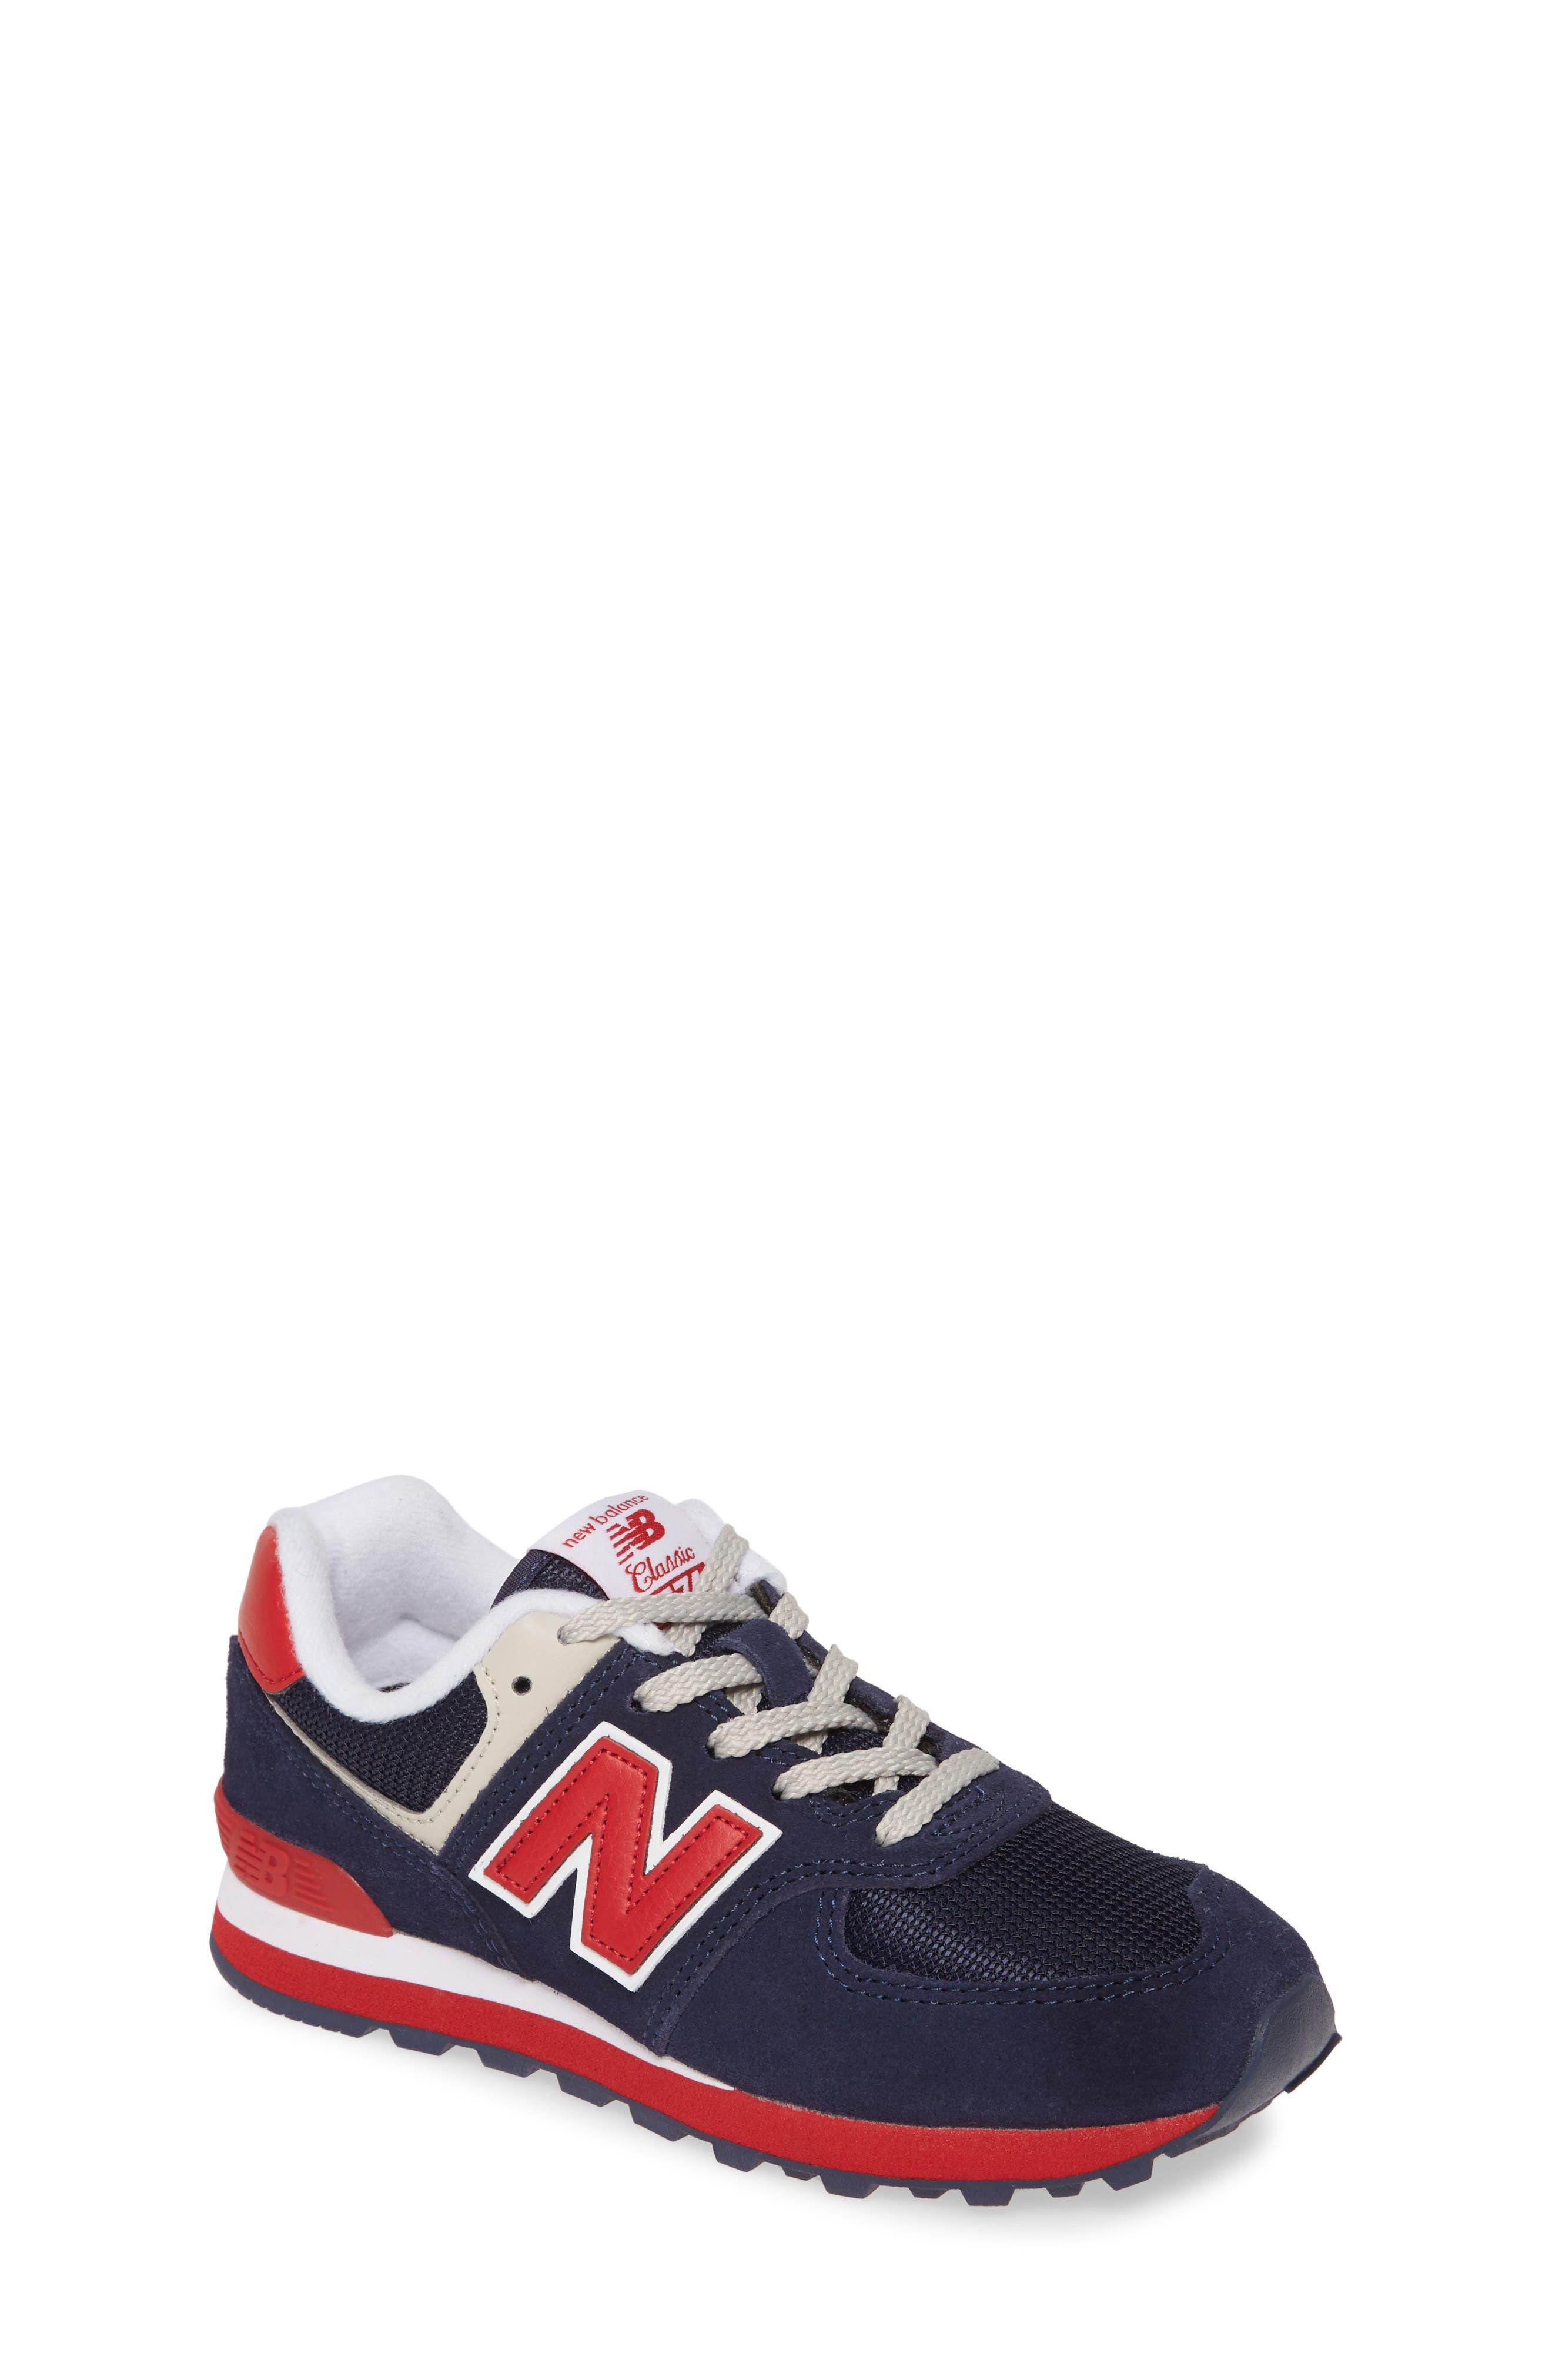 7a28c4082007a New Balance | Nordstrom